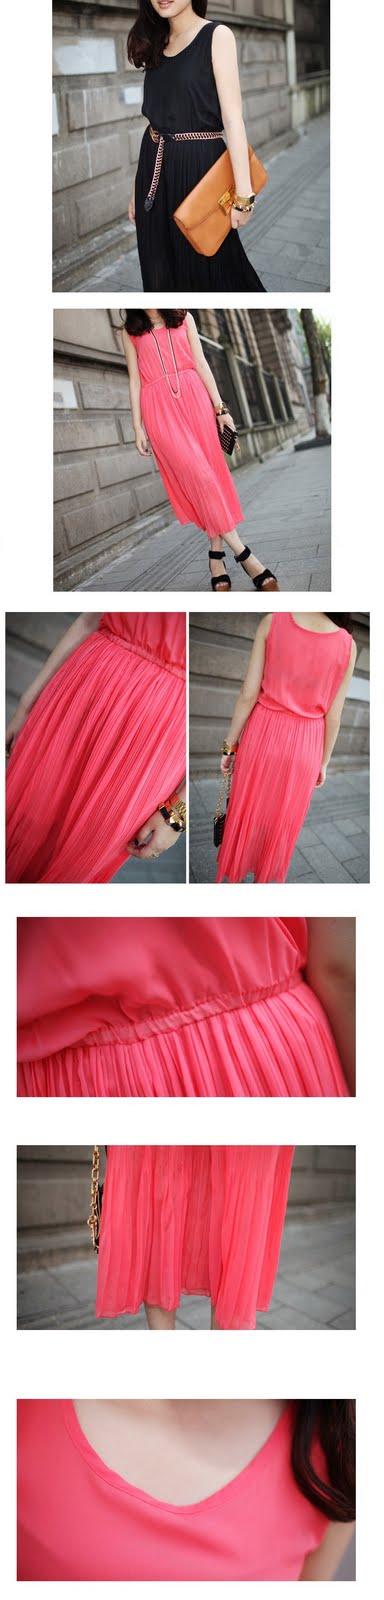 mazzy side cutout dress. The Drapey Long Top/Dress